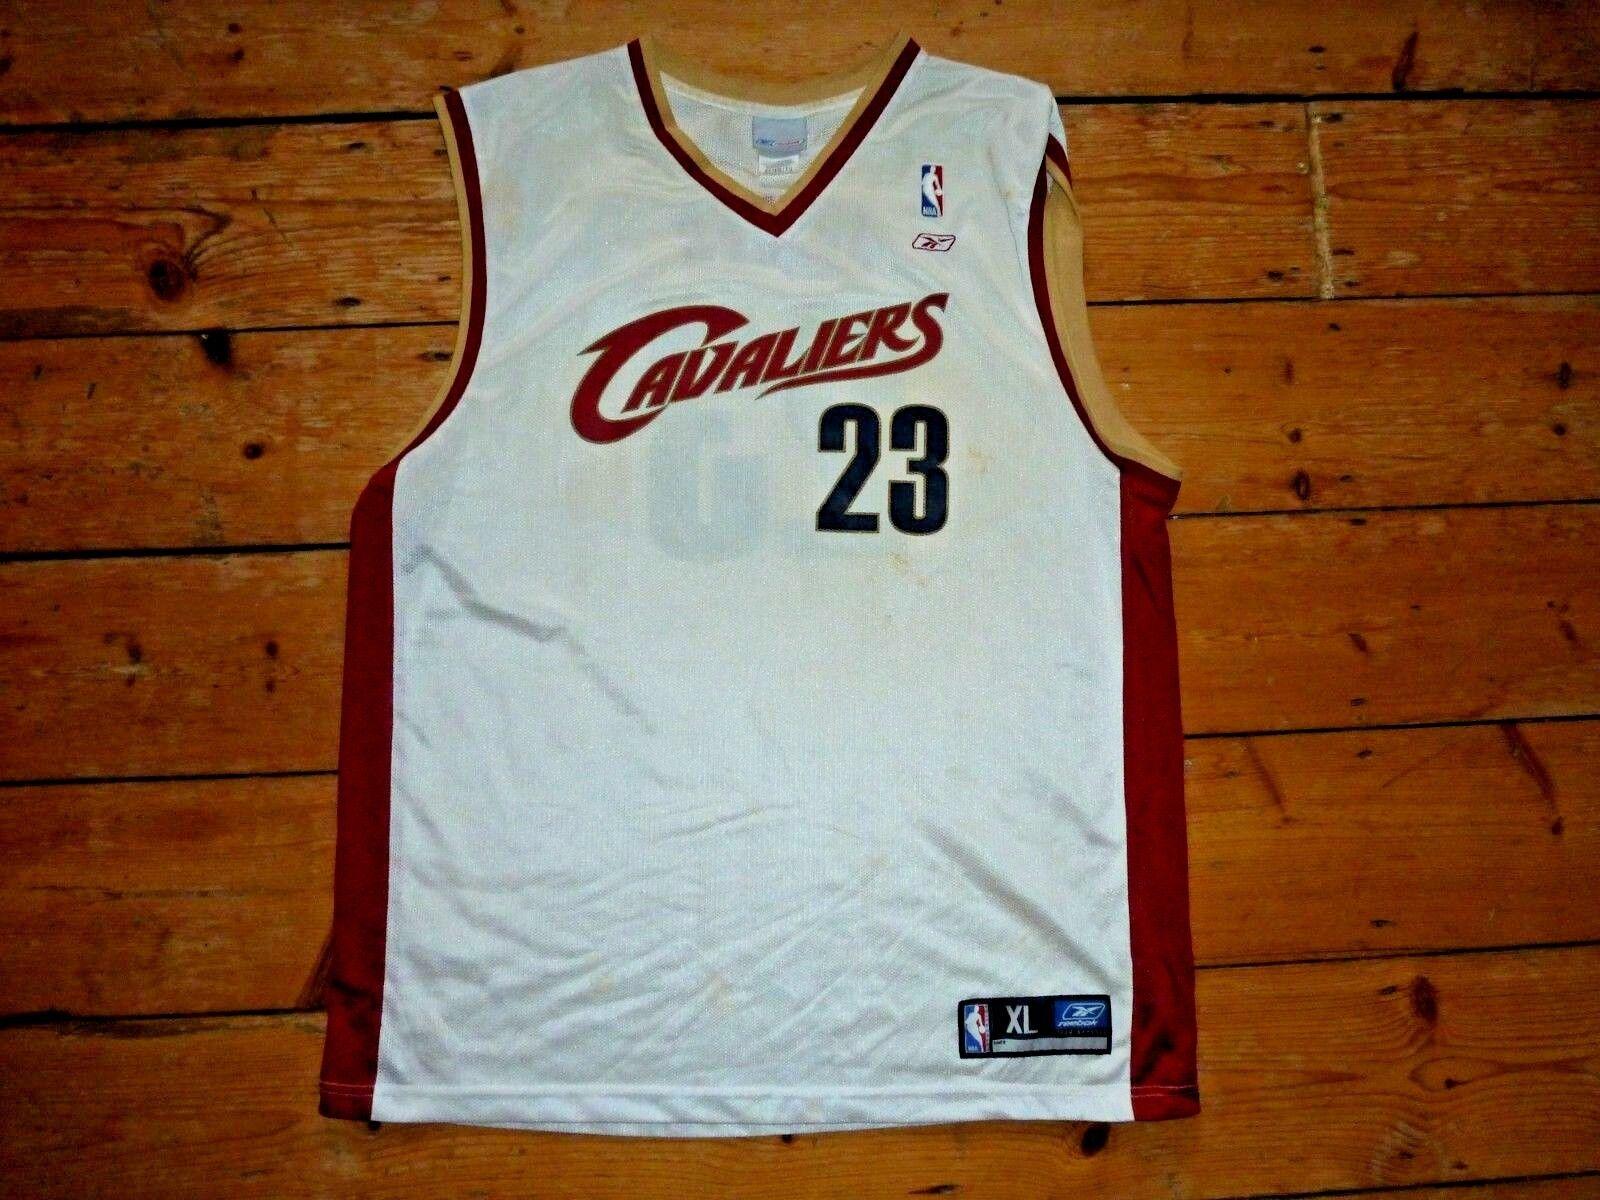 6ad2c9c6086 Size Original CAVALIERS JAMES BASKETBALL SHIRT reebok XL NBA ...